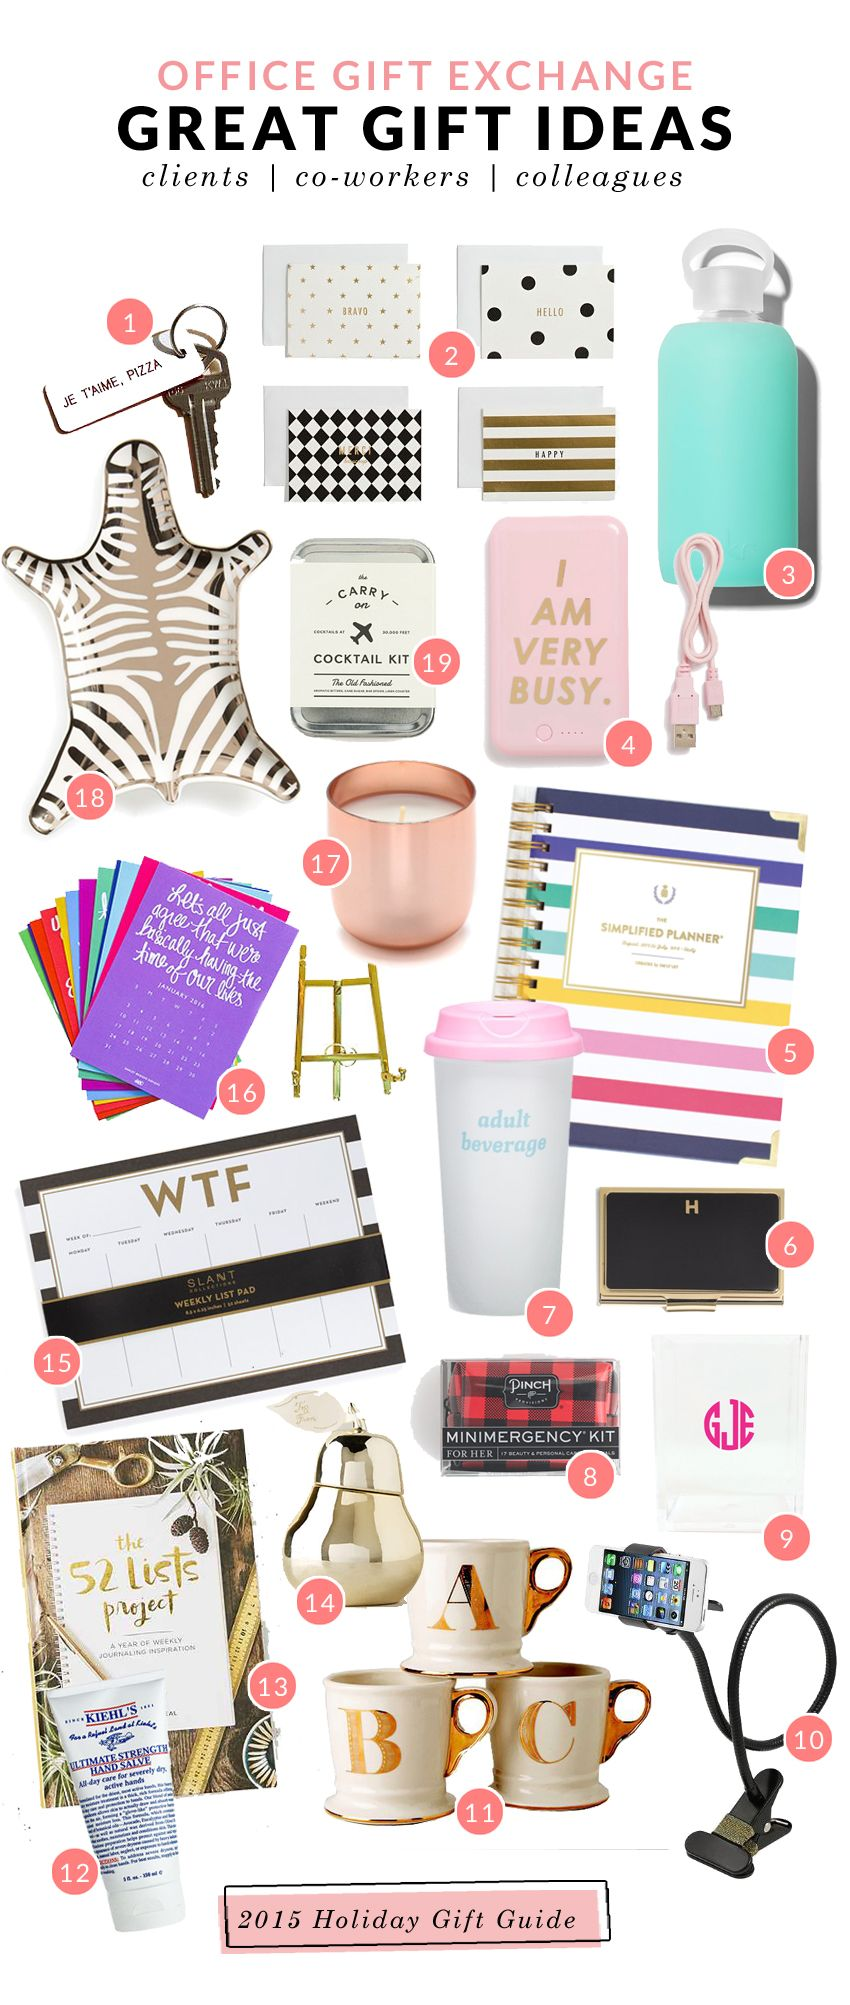 Great Secret Santa Gift Ideas: An ABD Desk Calendar!   #ispyABD